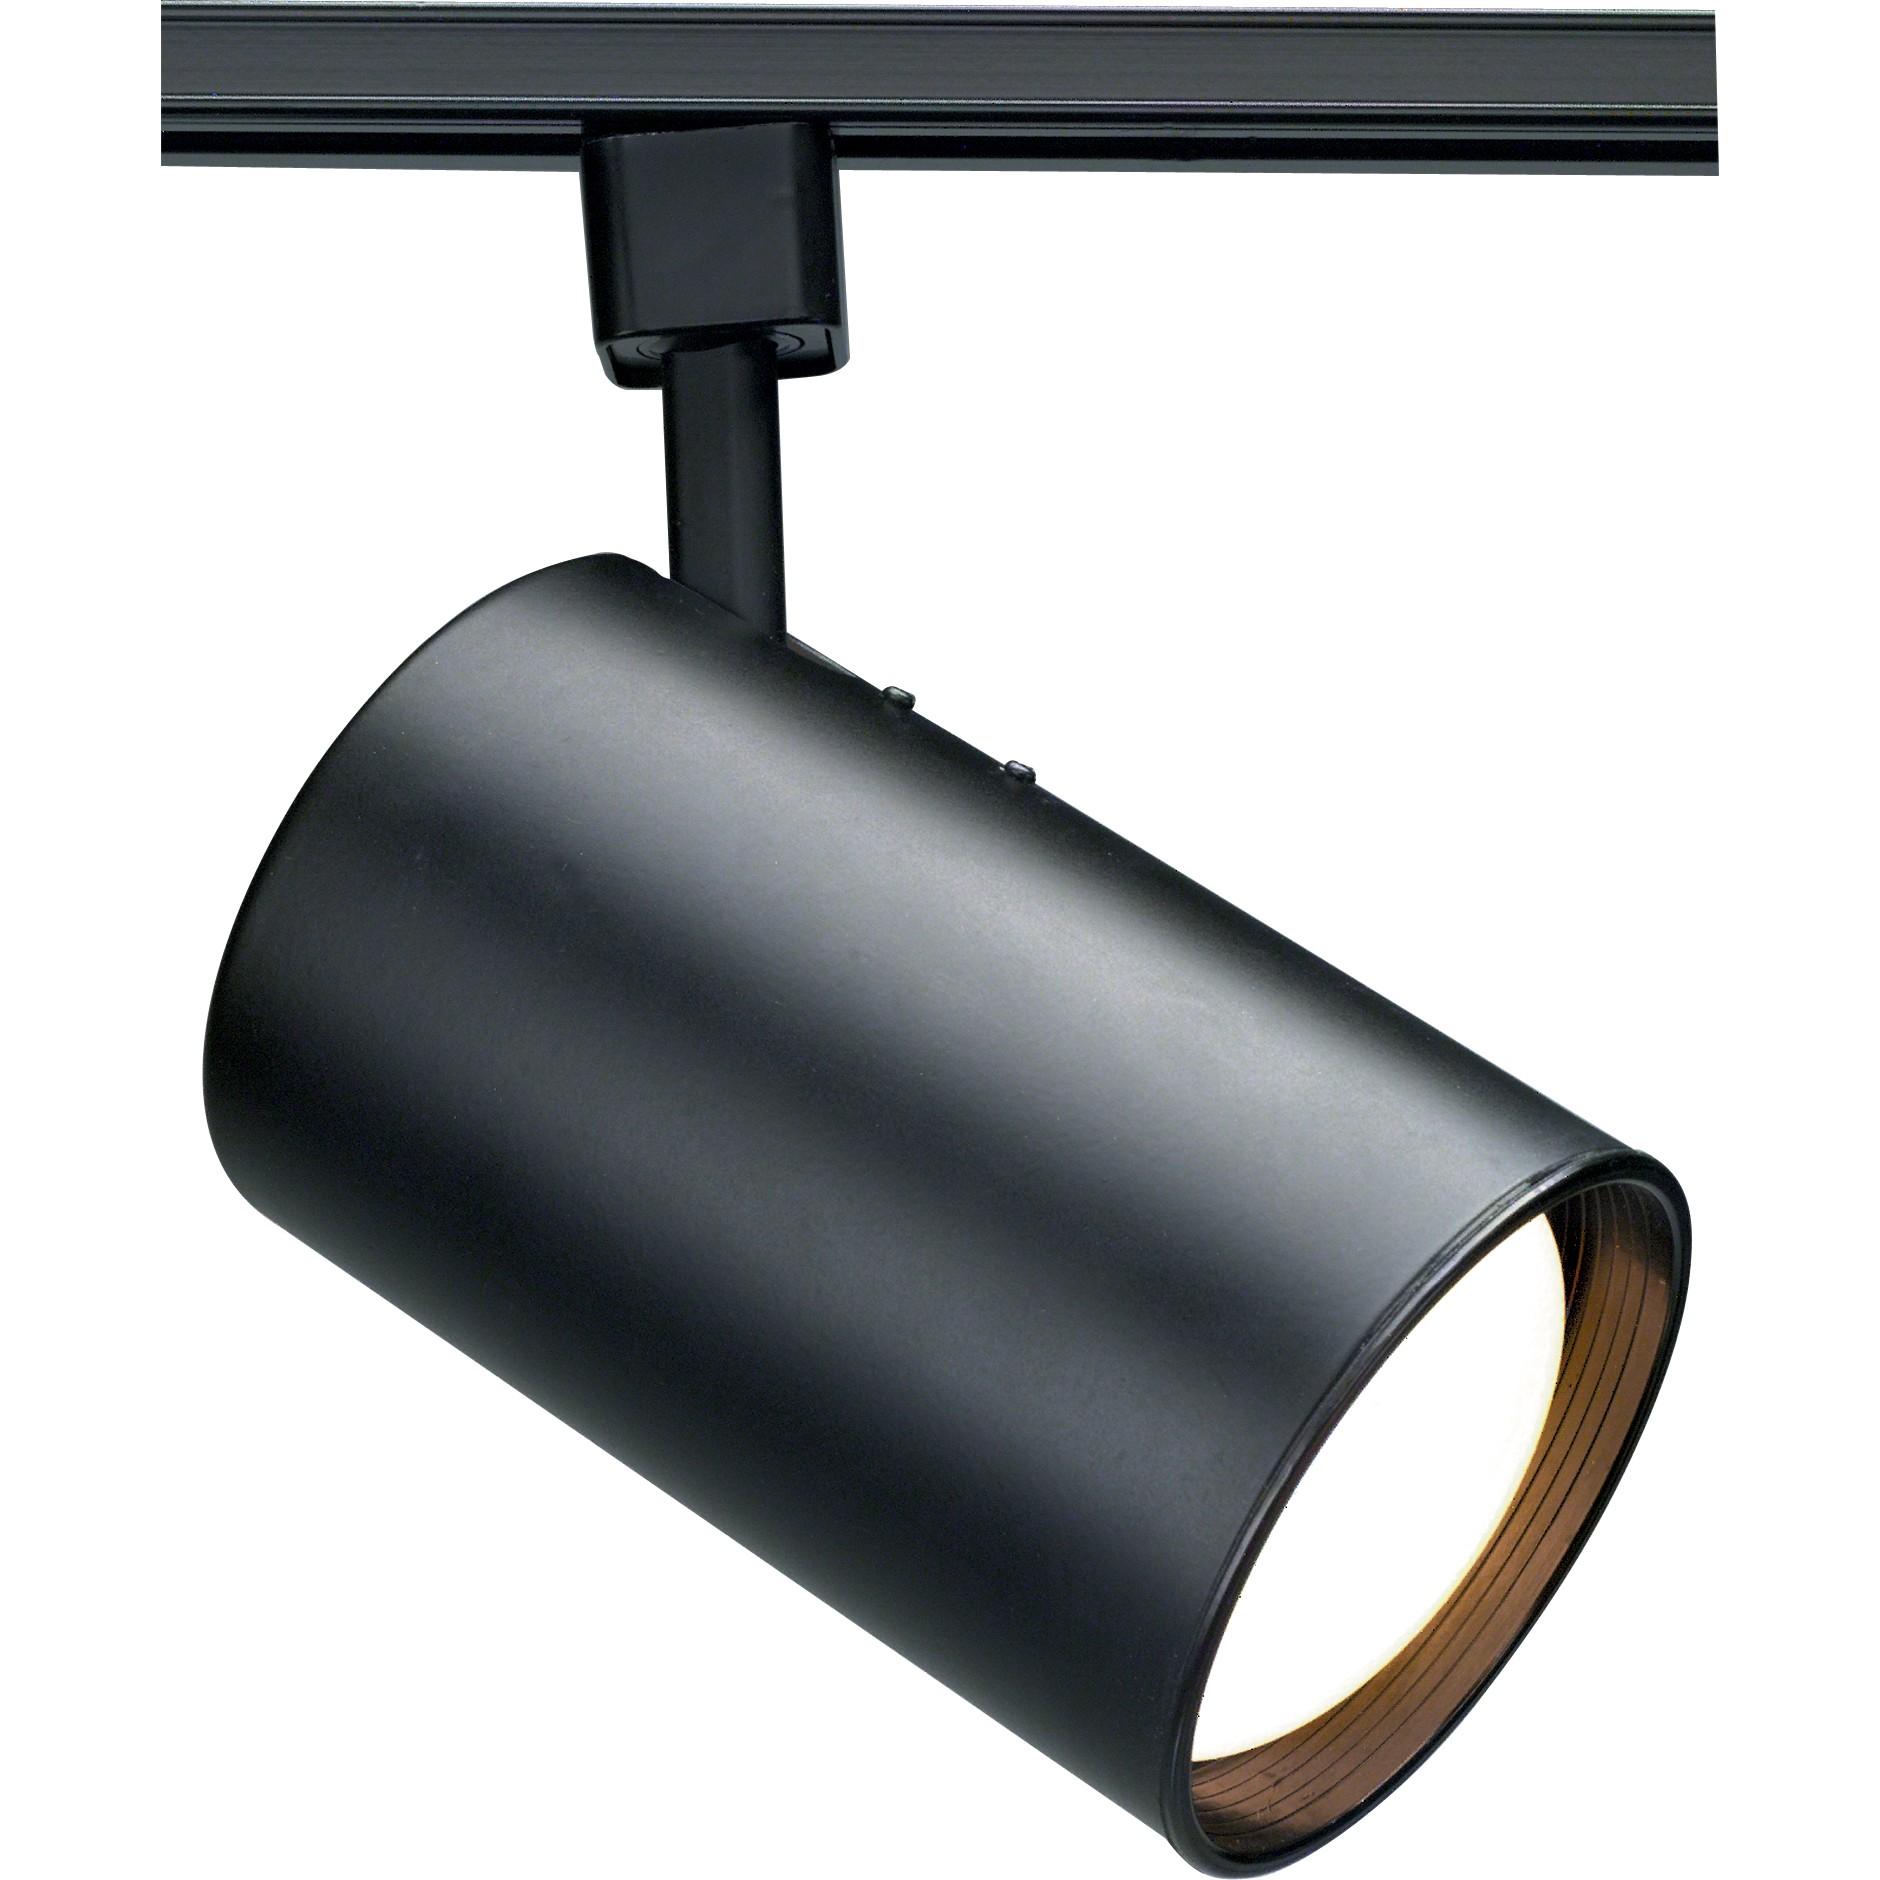 Satco Nuvo 50w Max R20 Par20 Straight Cylinder Track Head Black Finish Smart Led